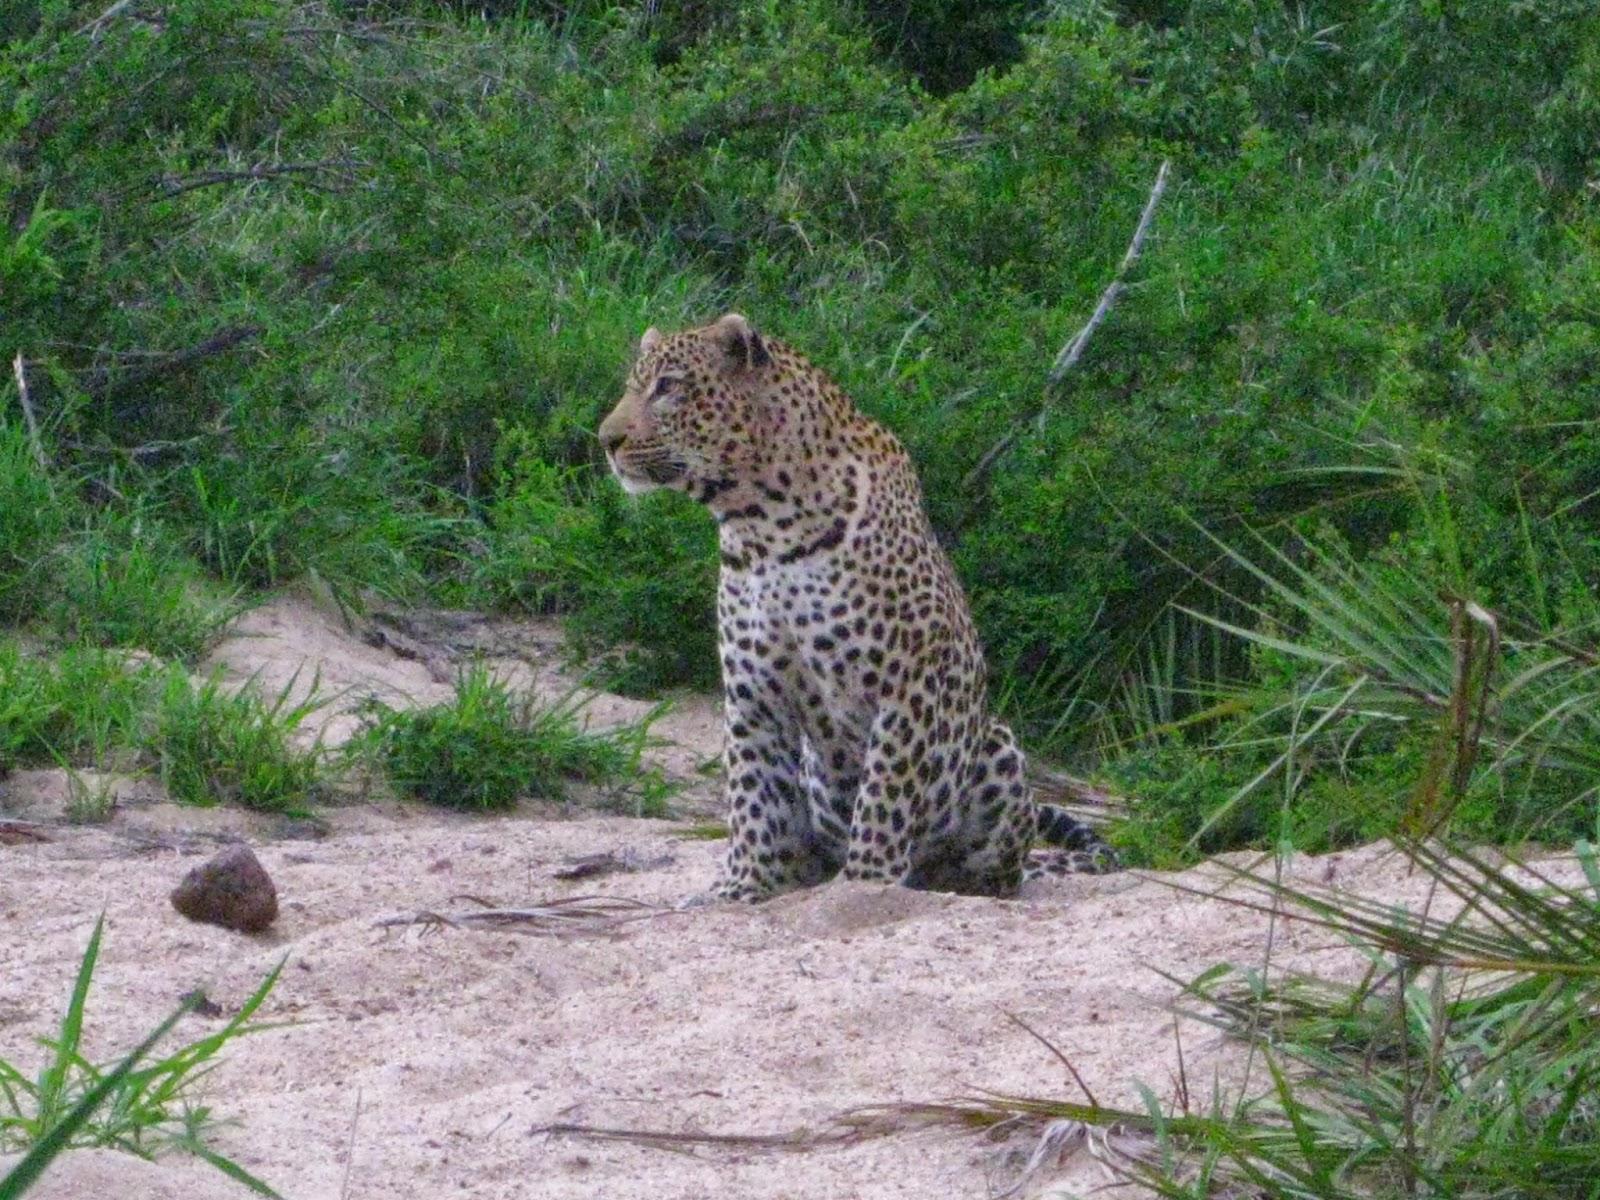 Sabi Sands - The leopard stops to rest